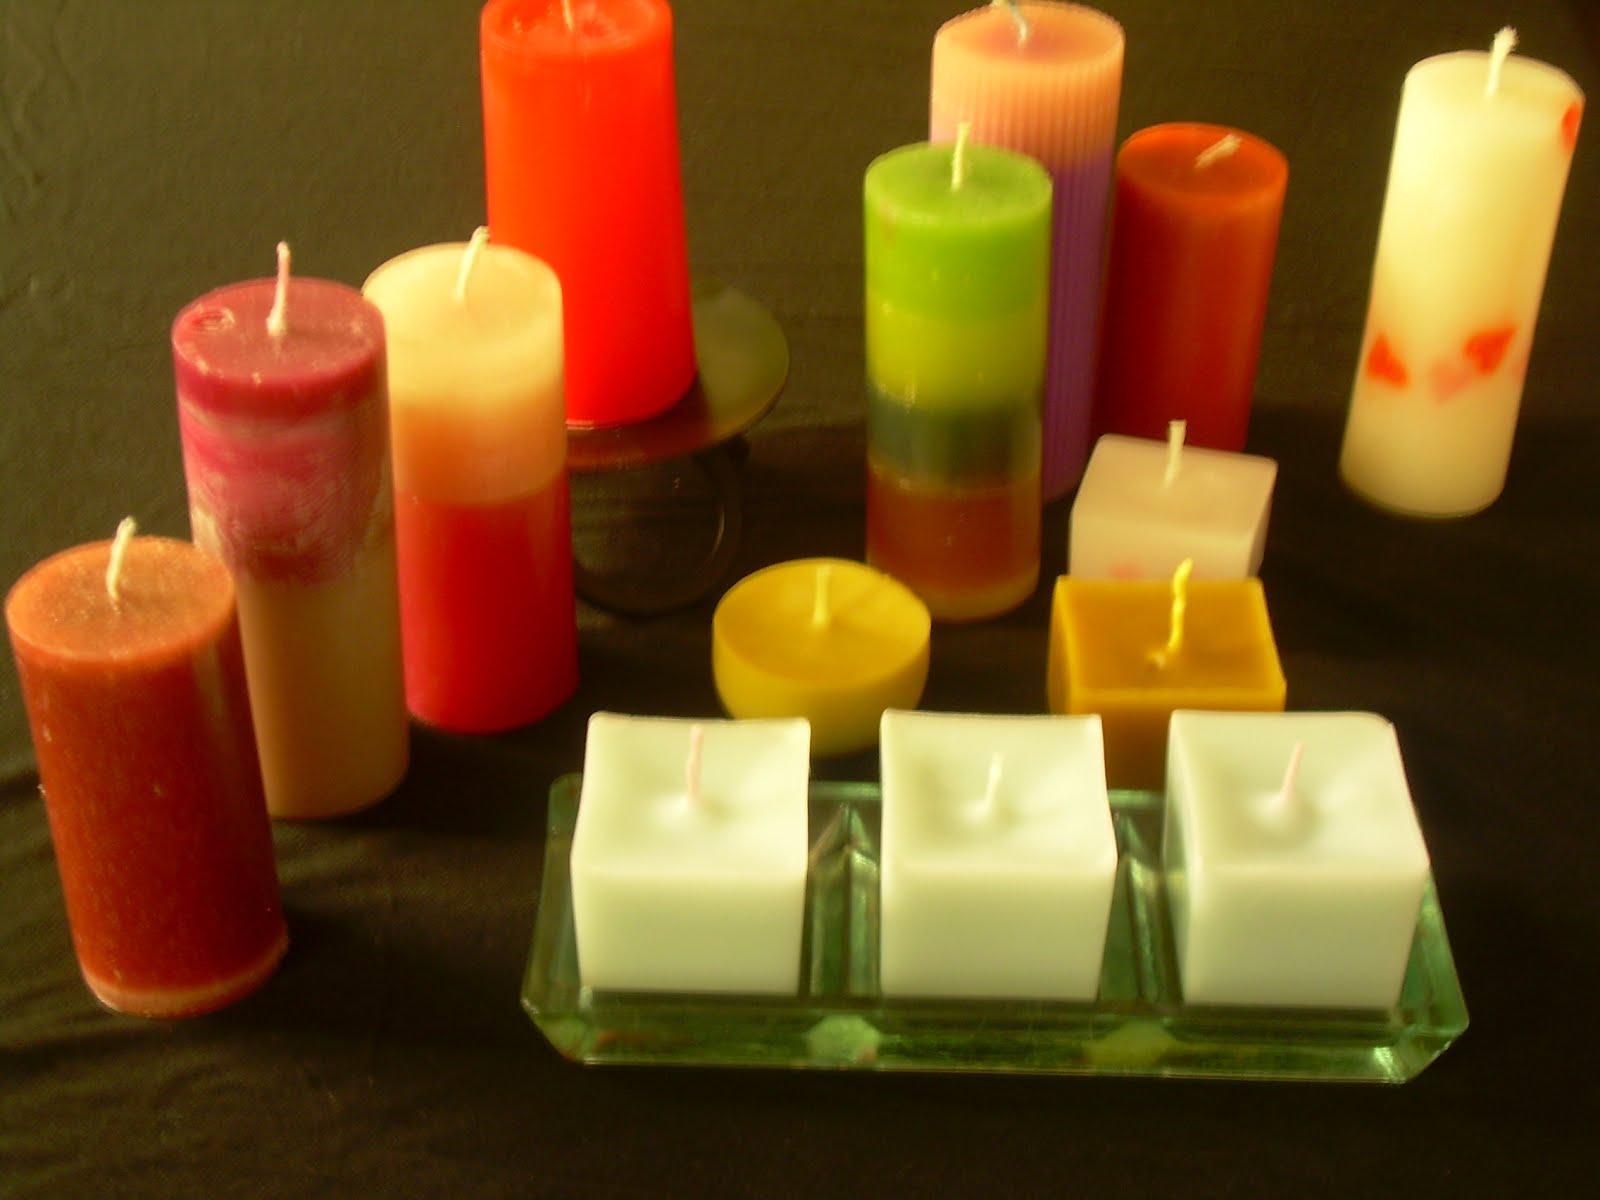 Naroha Como Hacer Velas - Hacer-velas